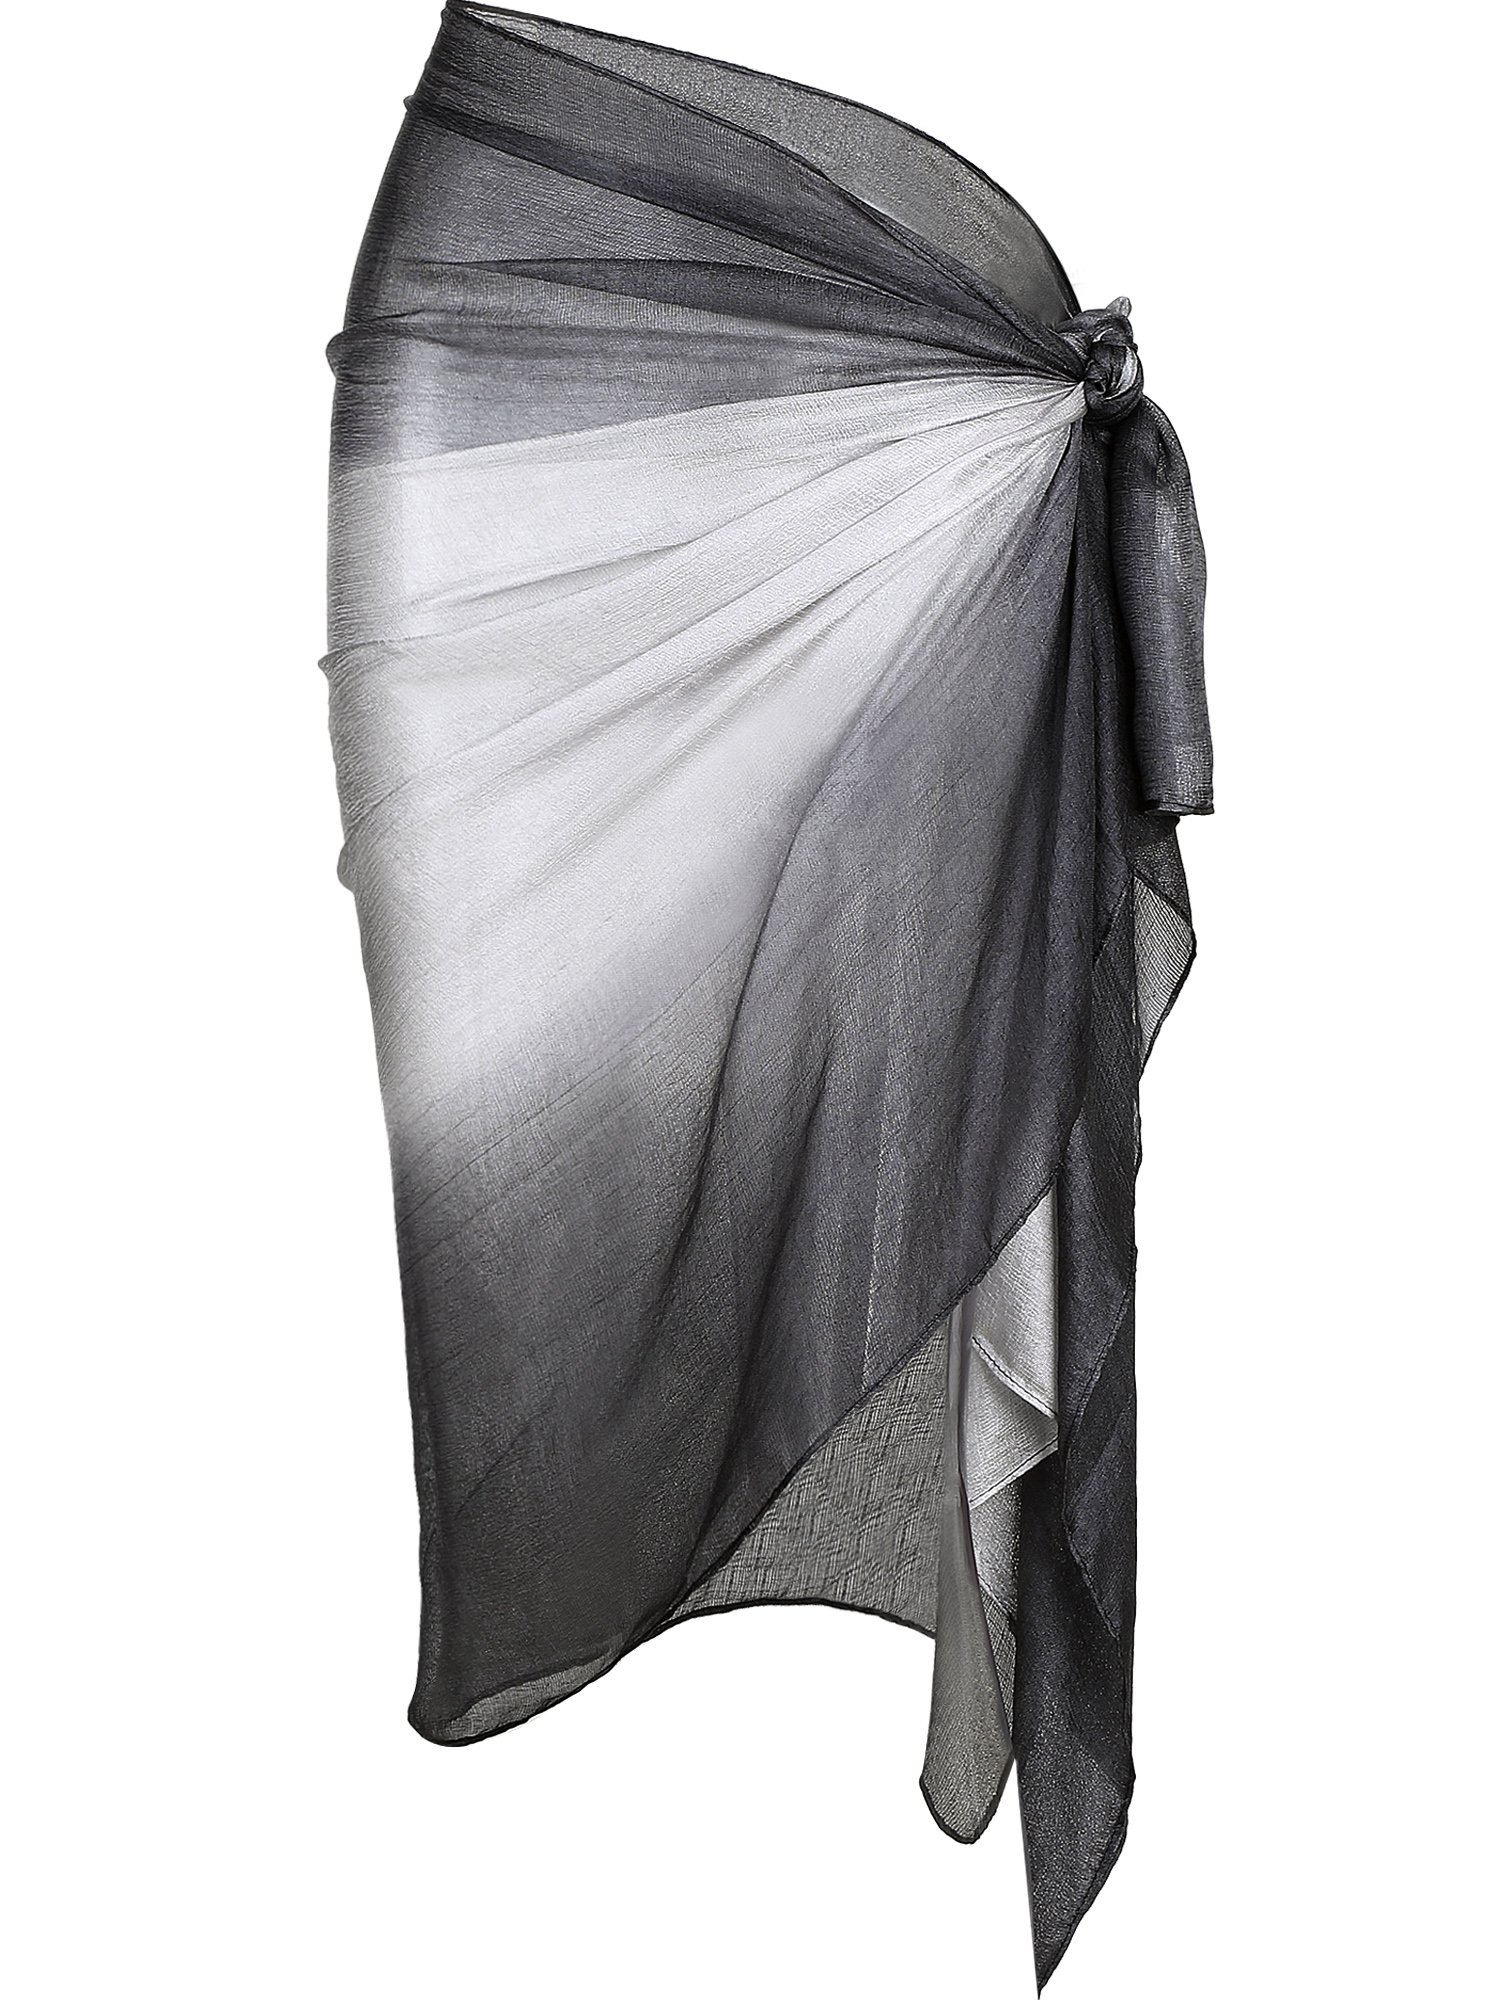 Hestya Women Pareo Swimsuit Beach Swimwear Gradient Color Bikini Sarong (Grey)